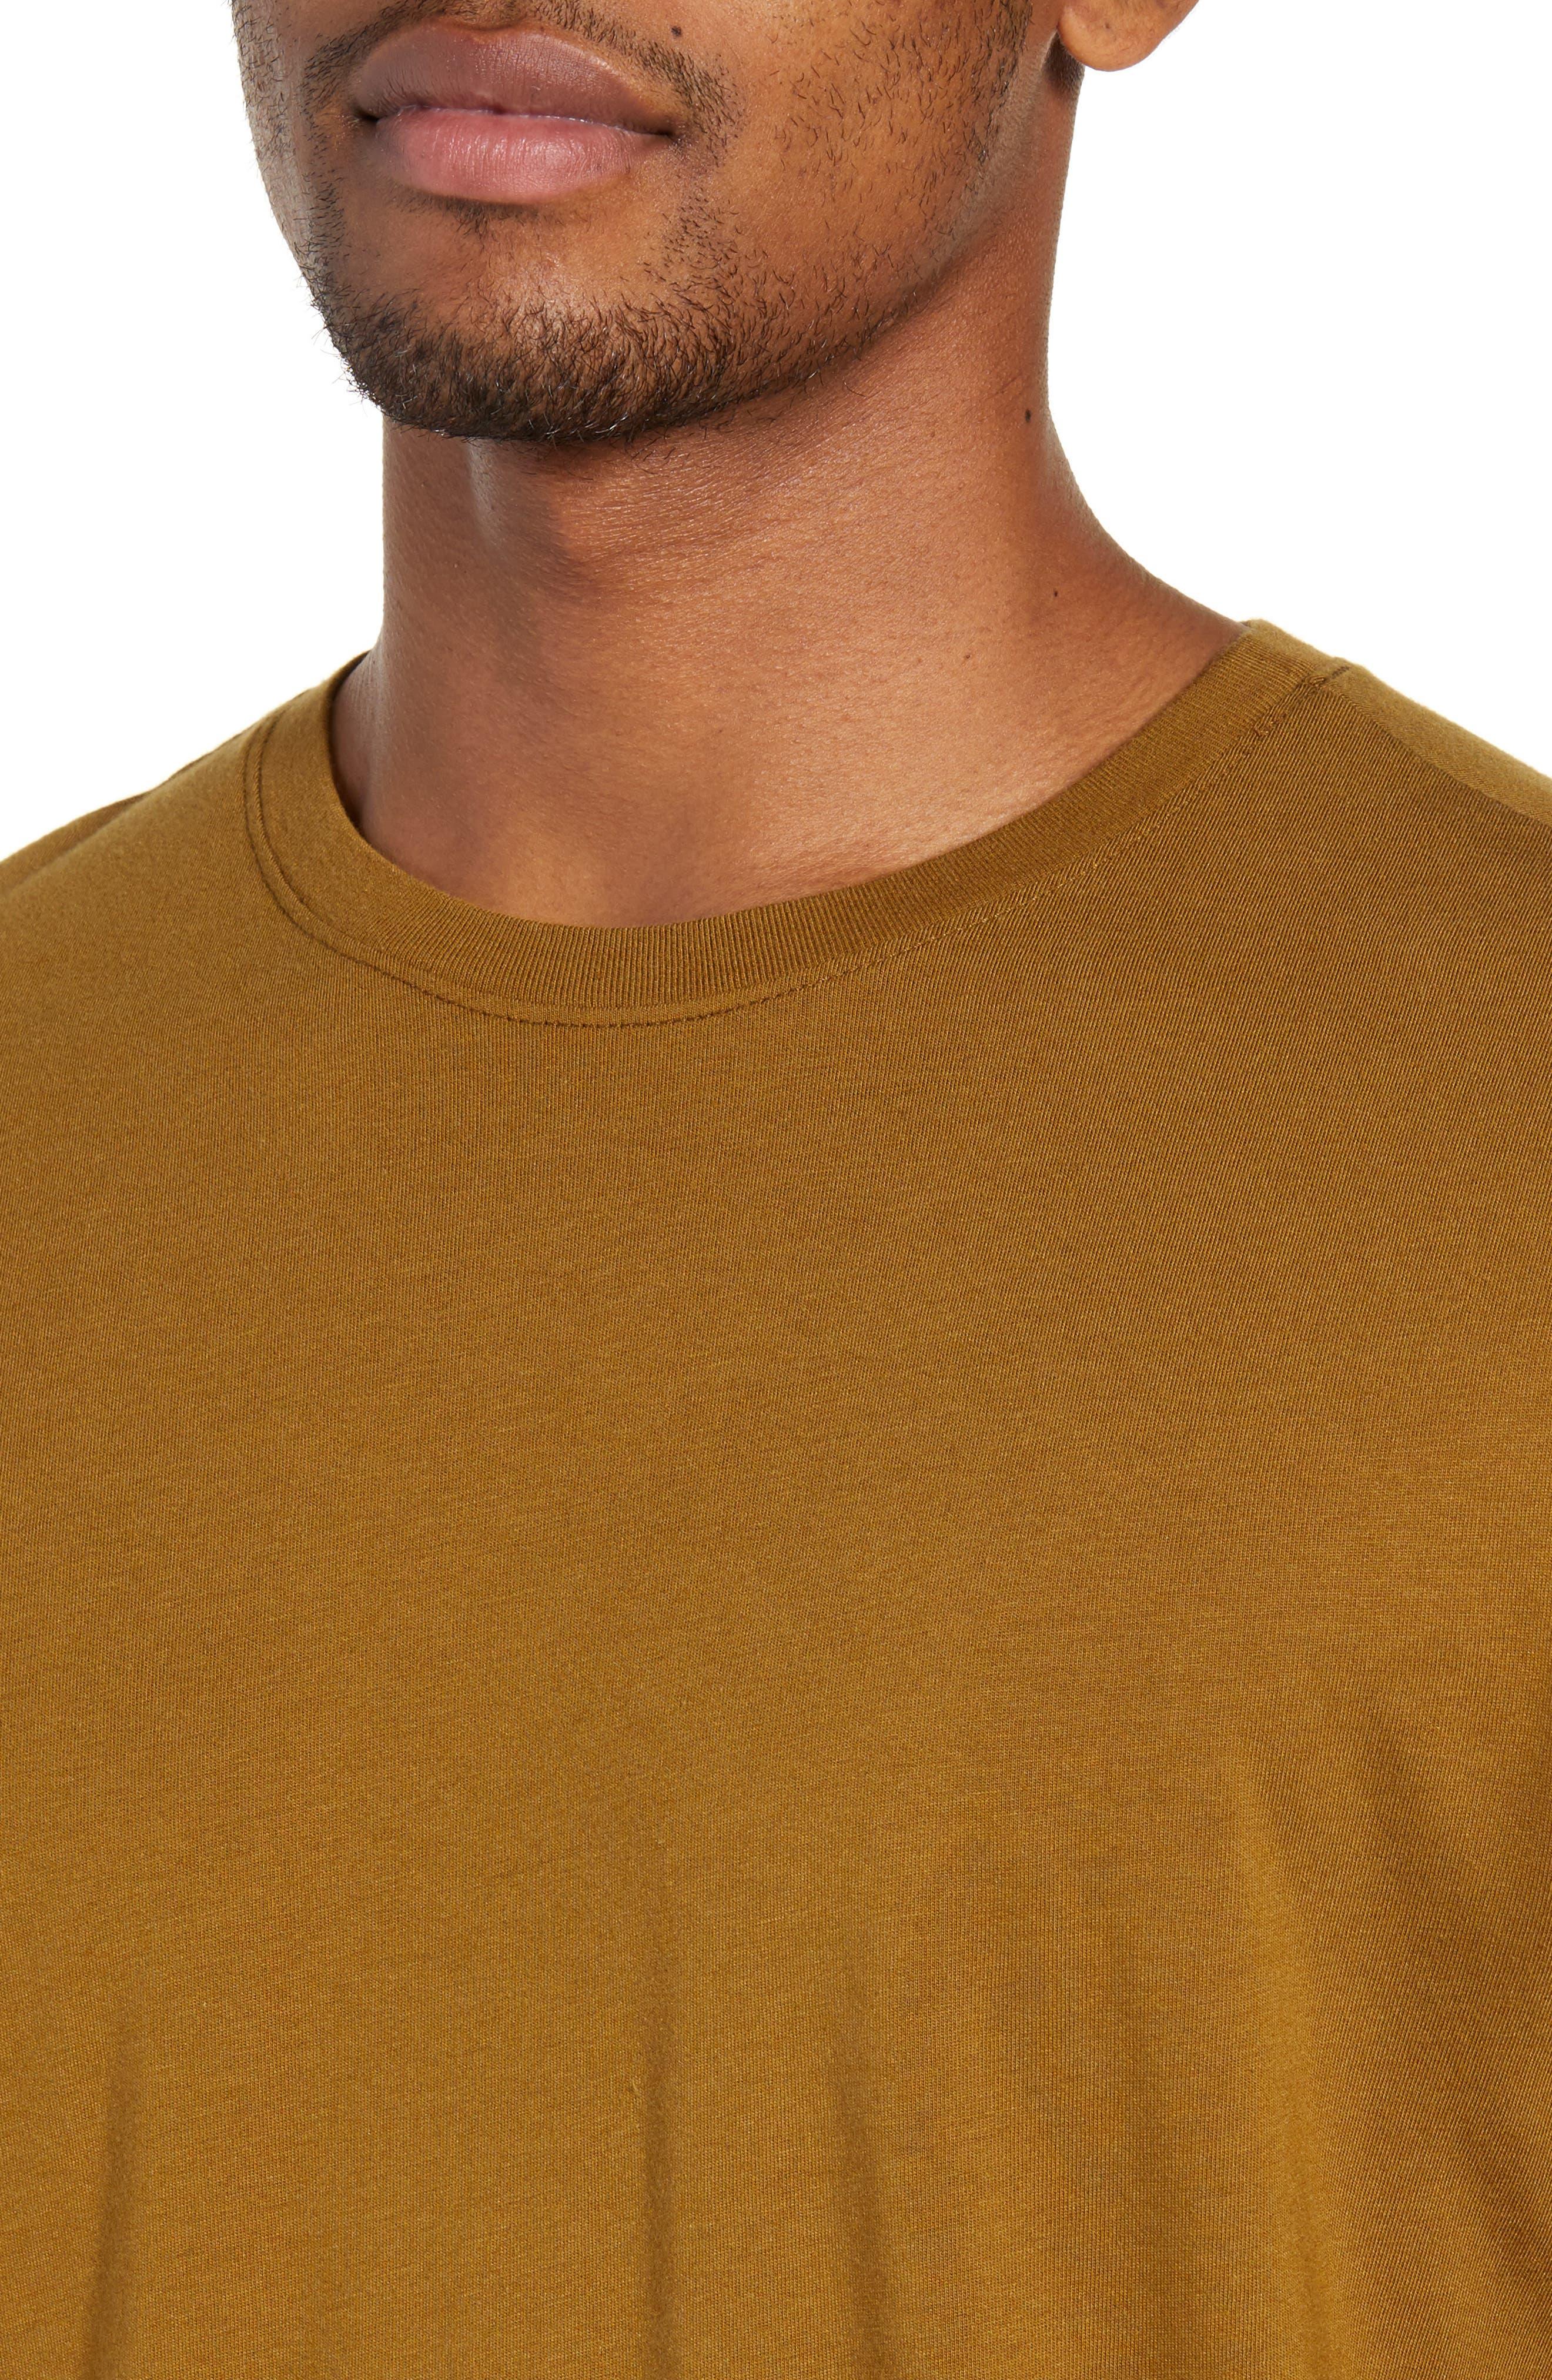 Bryce Slim Fit T-Shirt,                             Alternate thumbnail 4, color,                             GOLDEN OLIVE